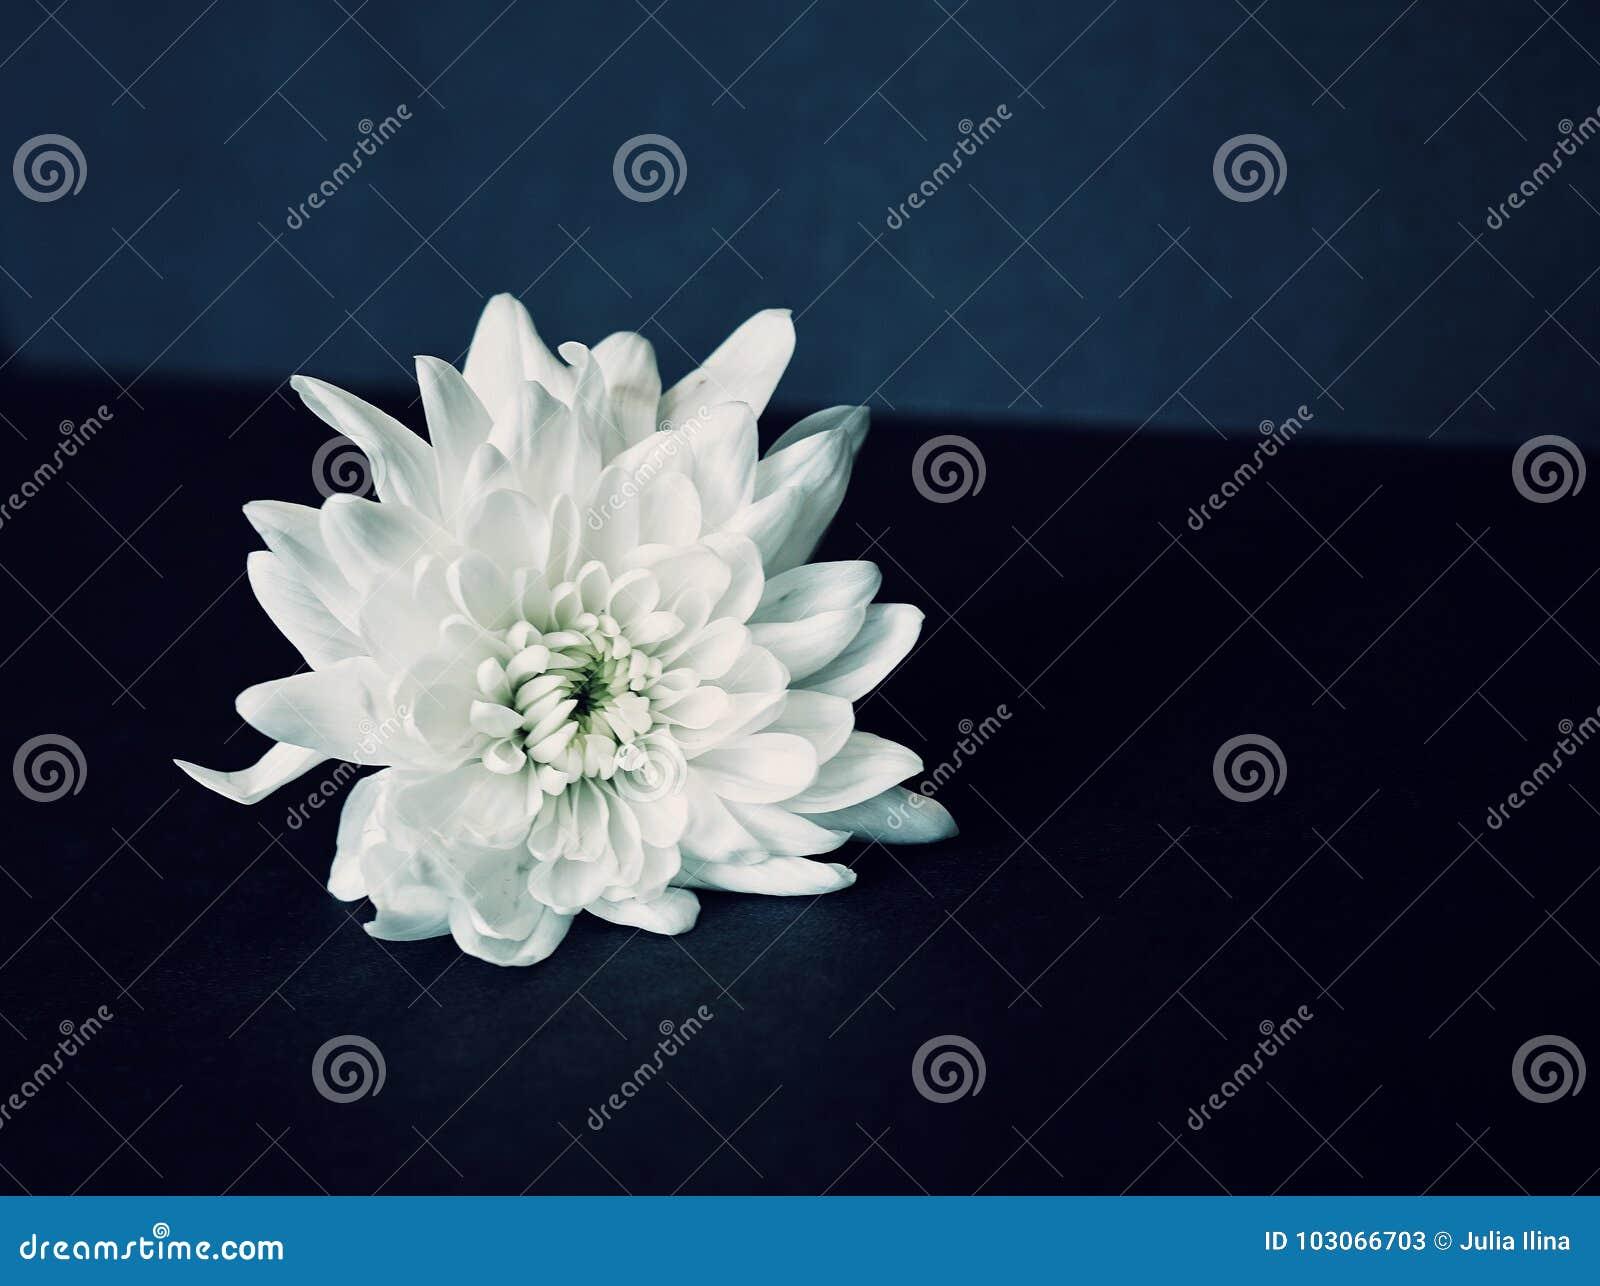 Chrysanthemum Flower White Close Up Background Black Stock Image